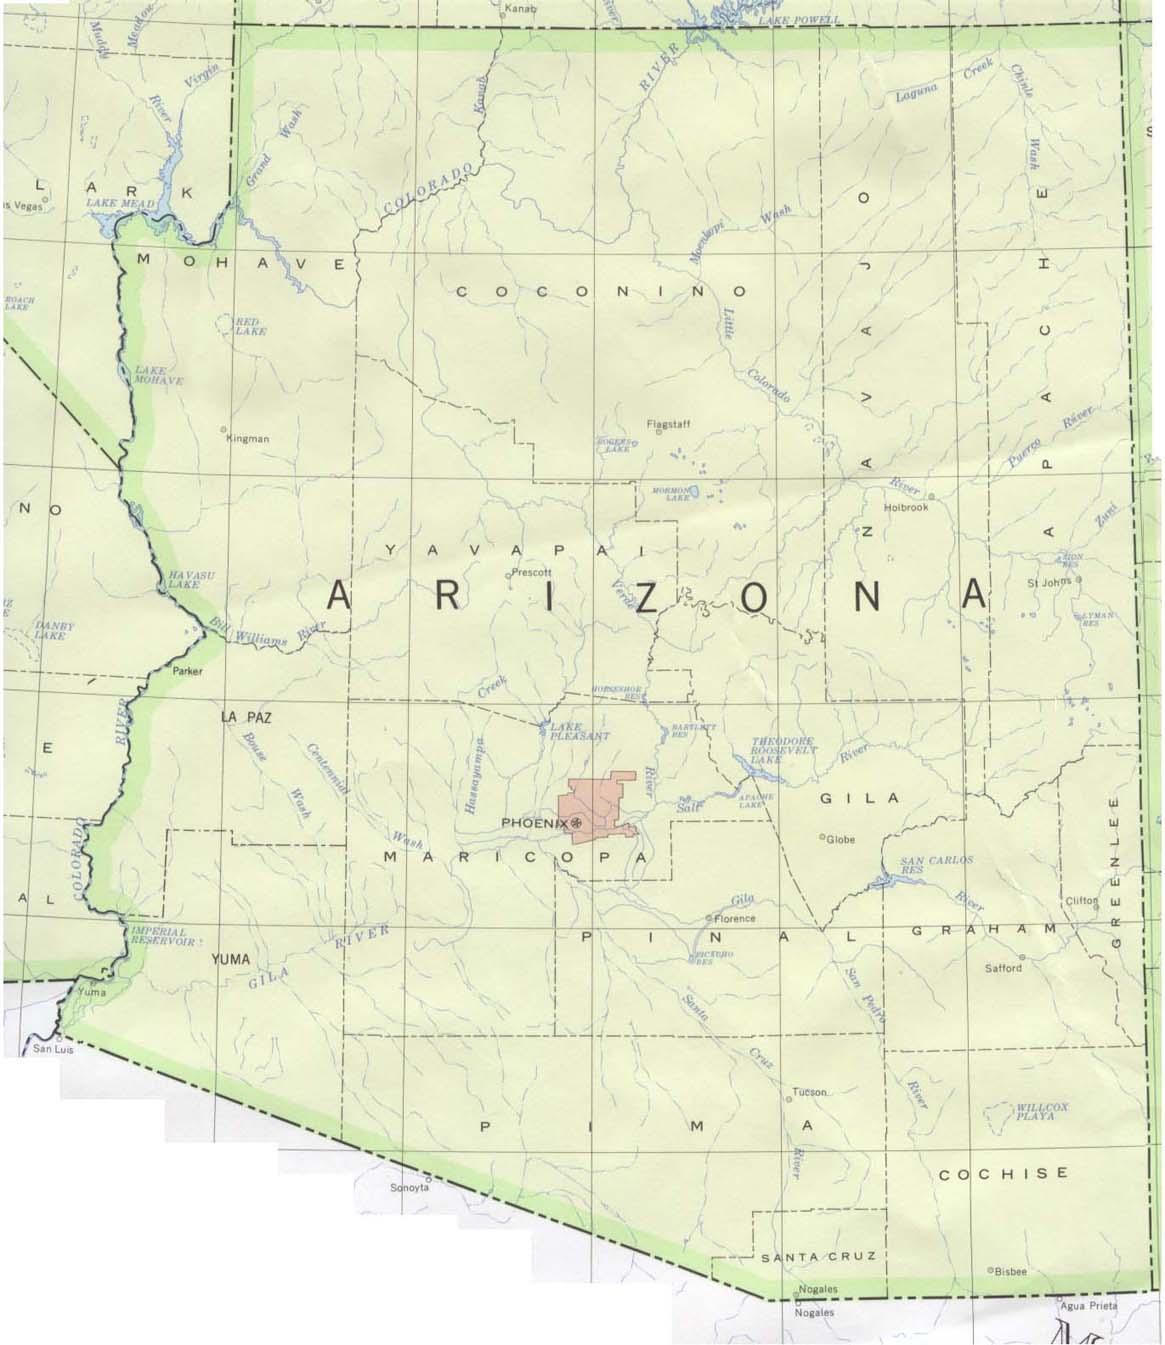 Map Of Arizona And Surrounding States Swimnovacom - Us map arizona